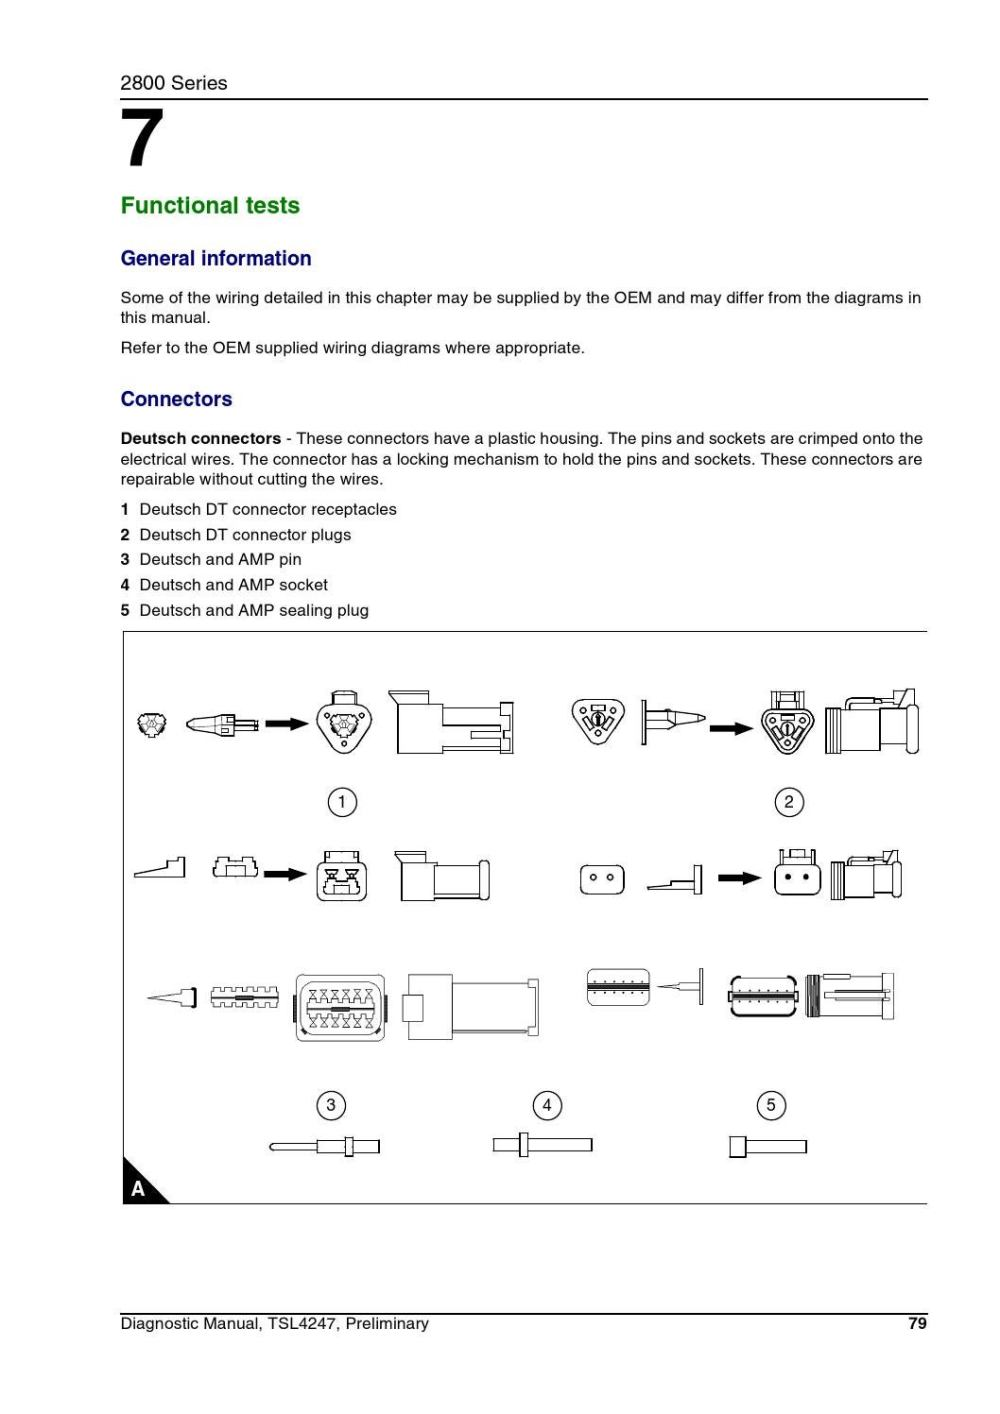 medium resolution of 2800 series perkins diagnostic manual